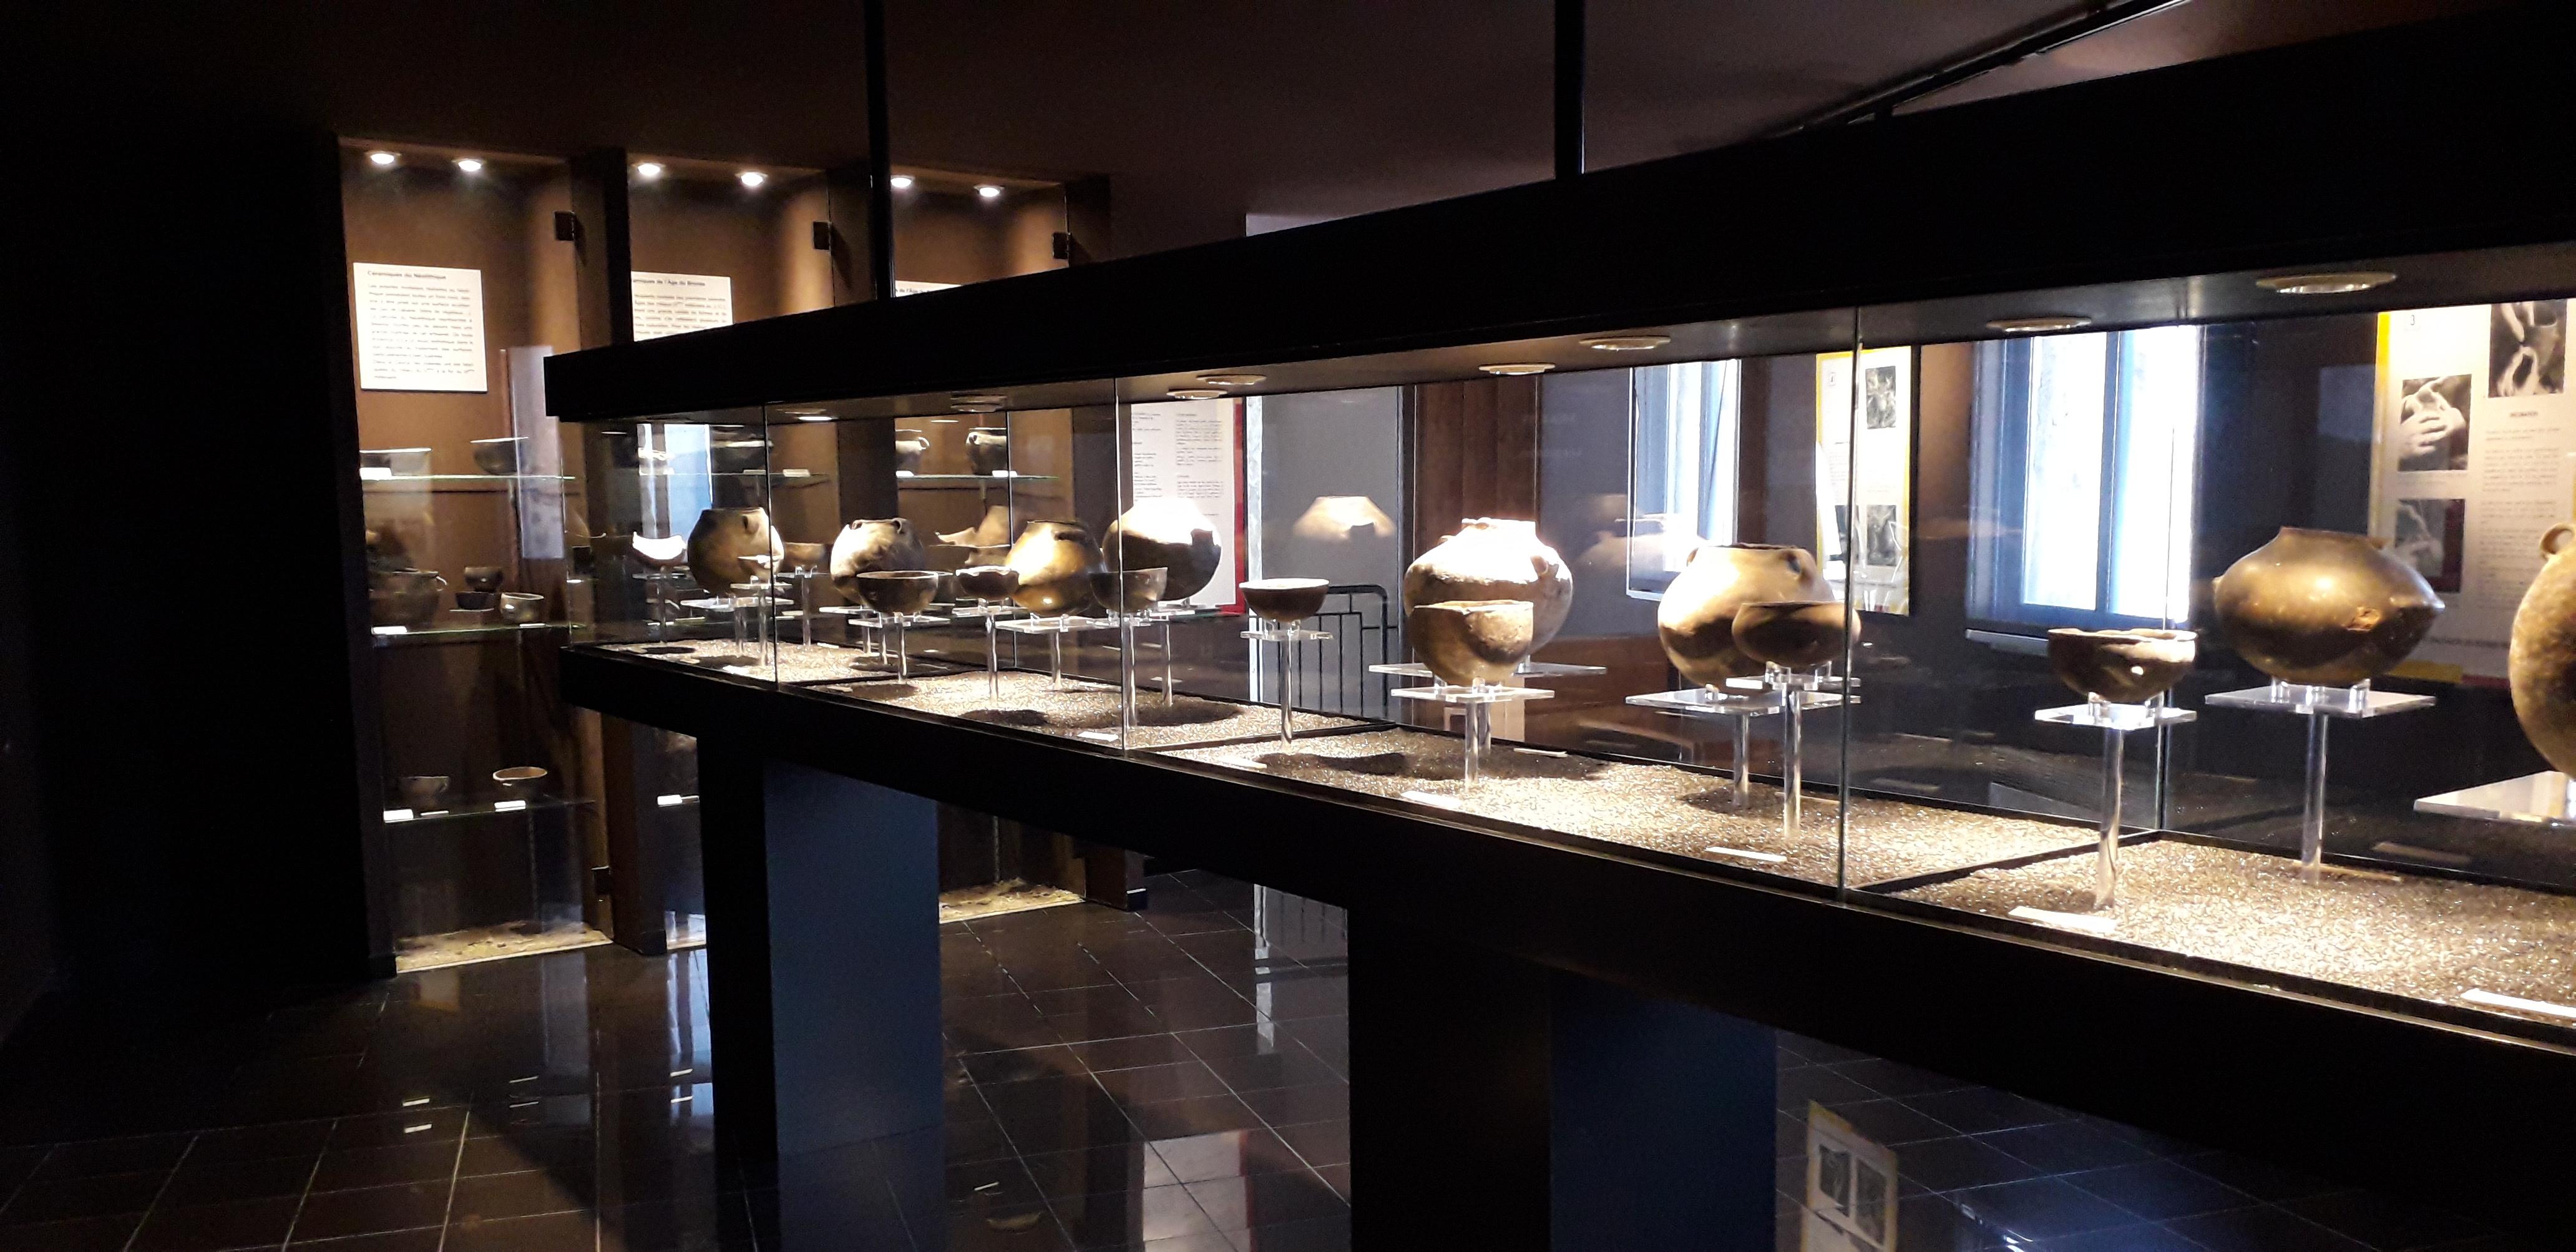 salle des poteries.jpg